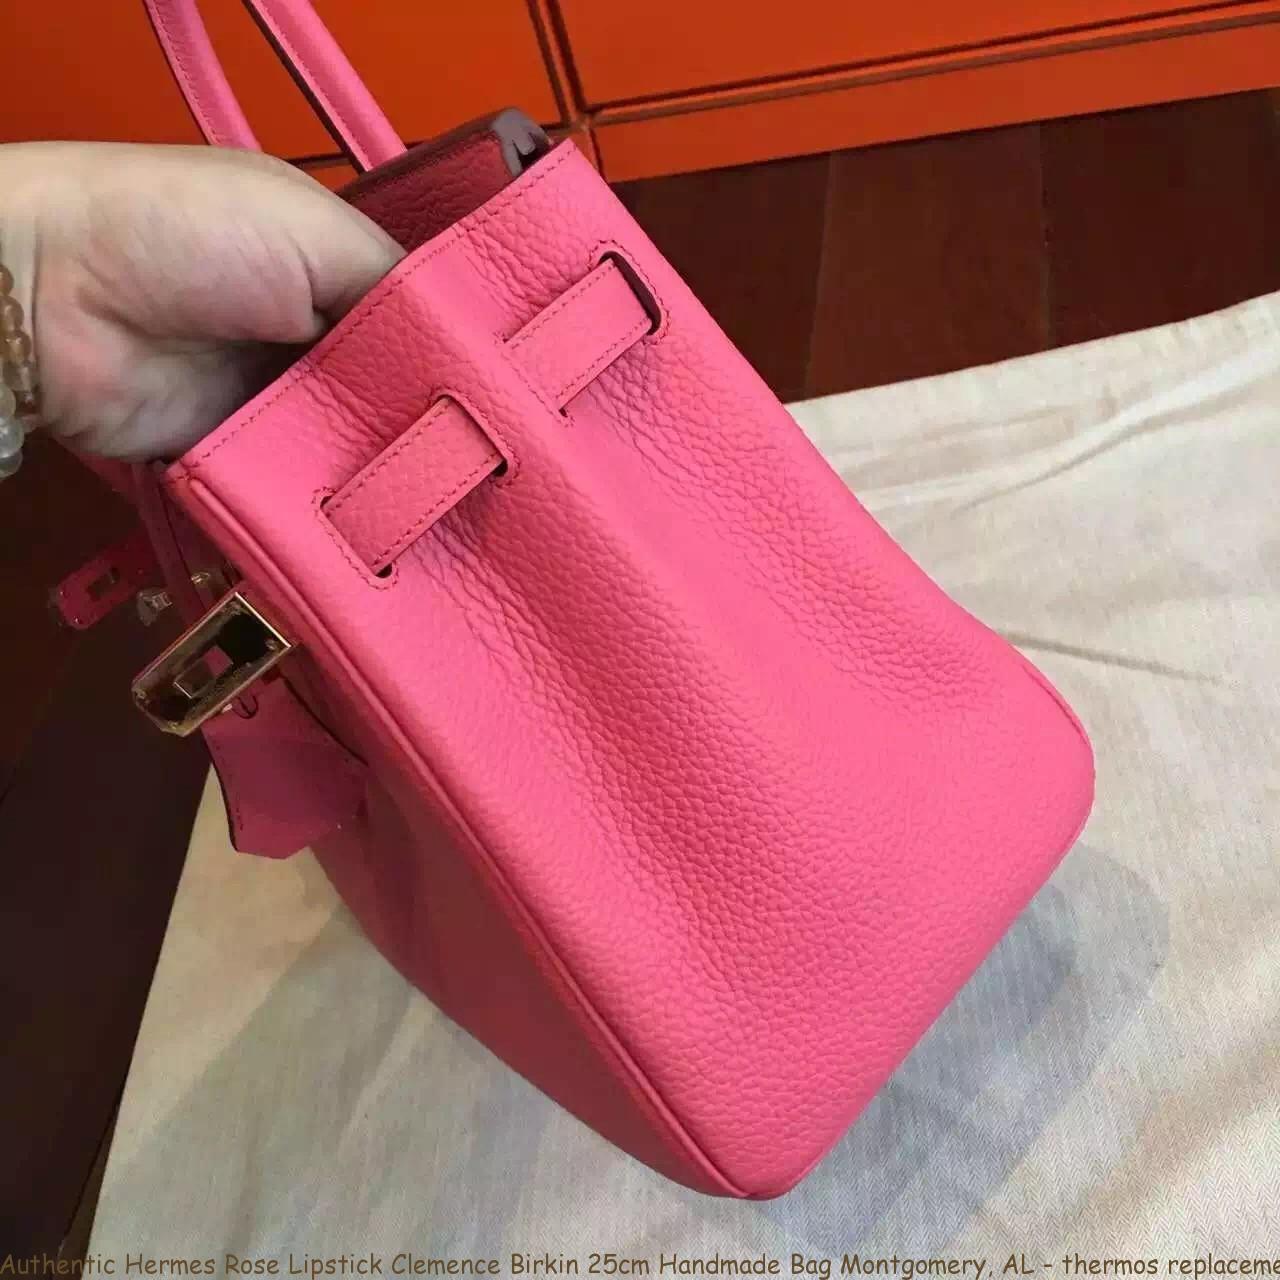 Authentic Hermes Rose Lipstick Clemence Birkin 25cm Handmade Bag ... c52aa21a69